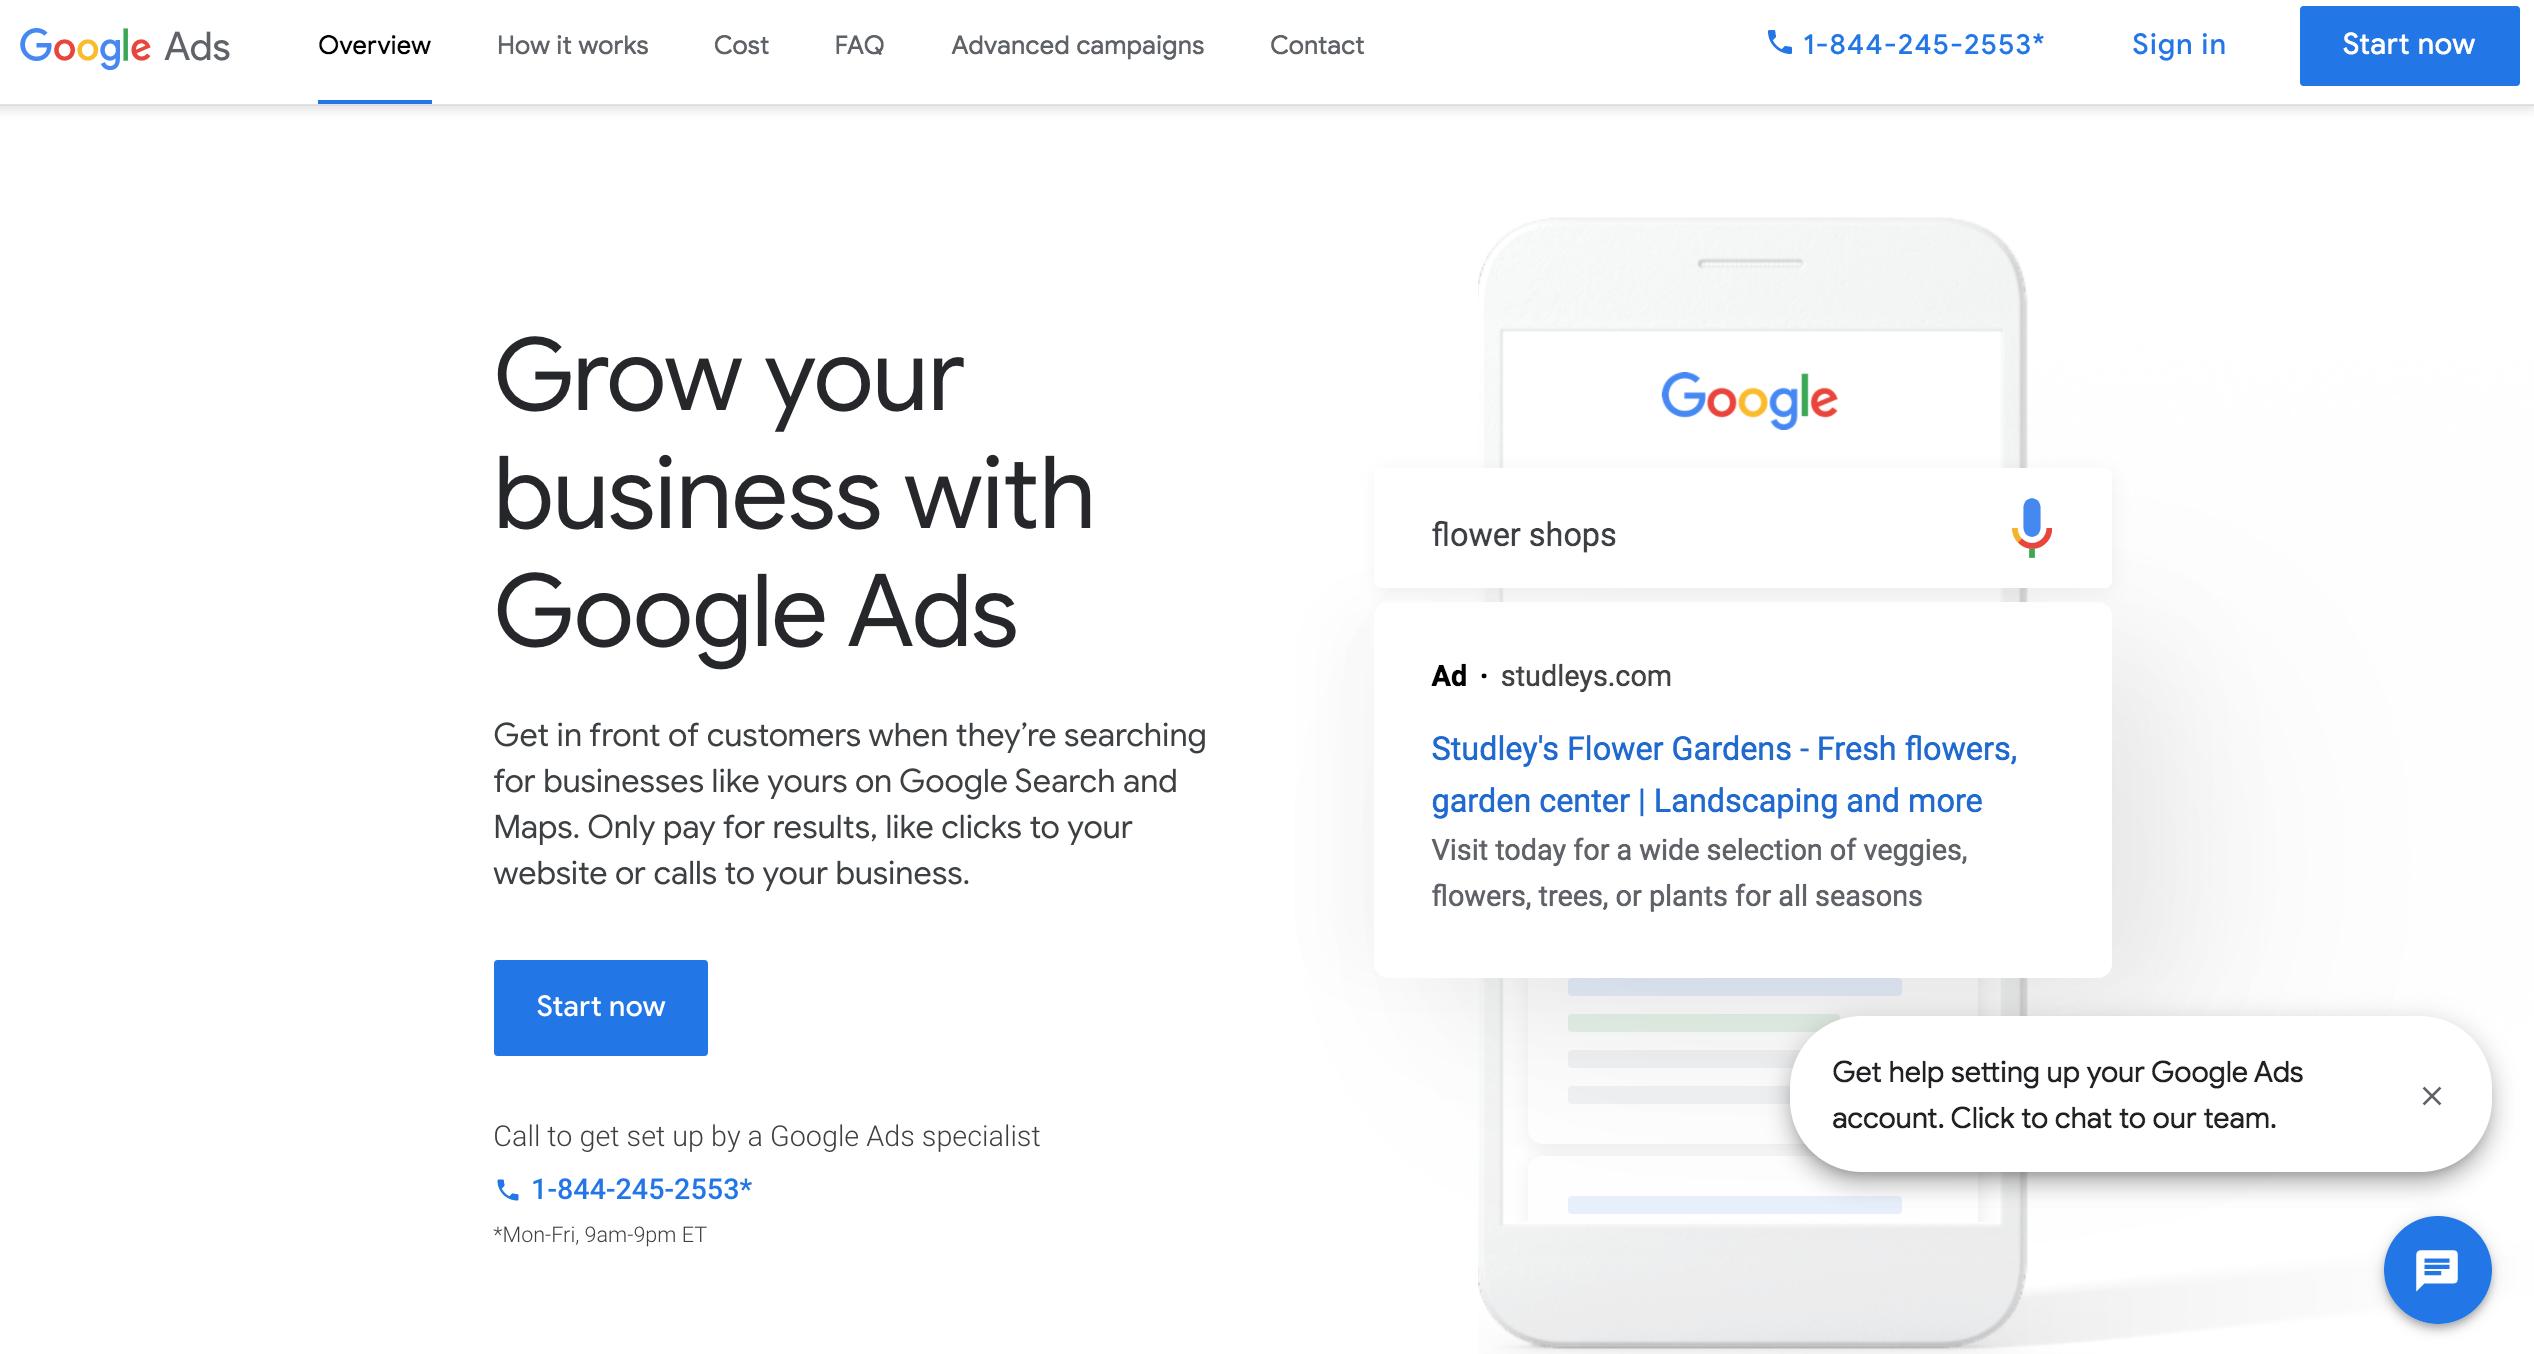 Start Now w/ Google Ads